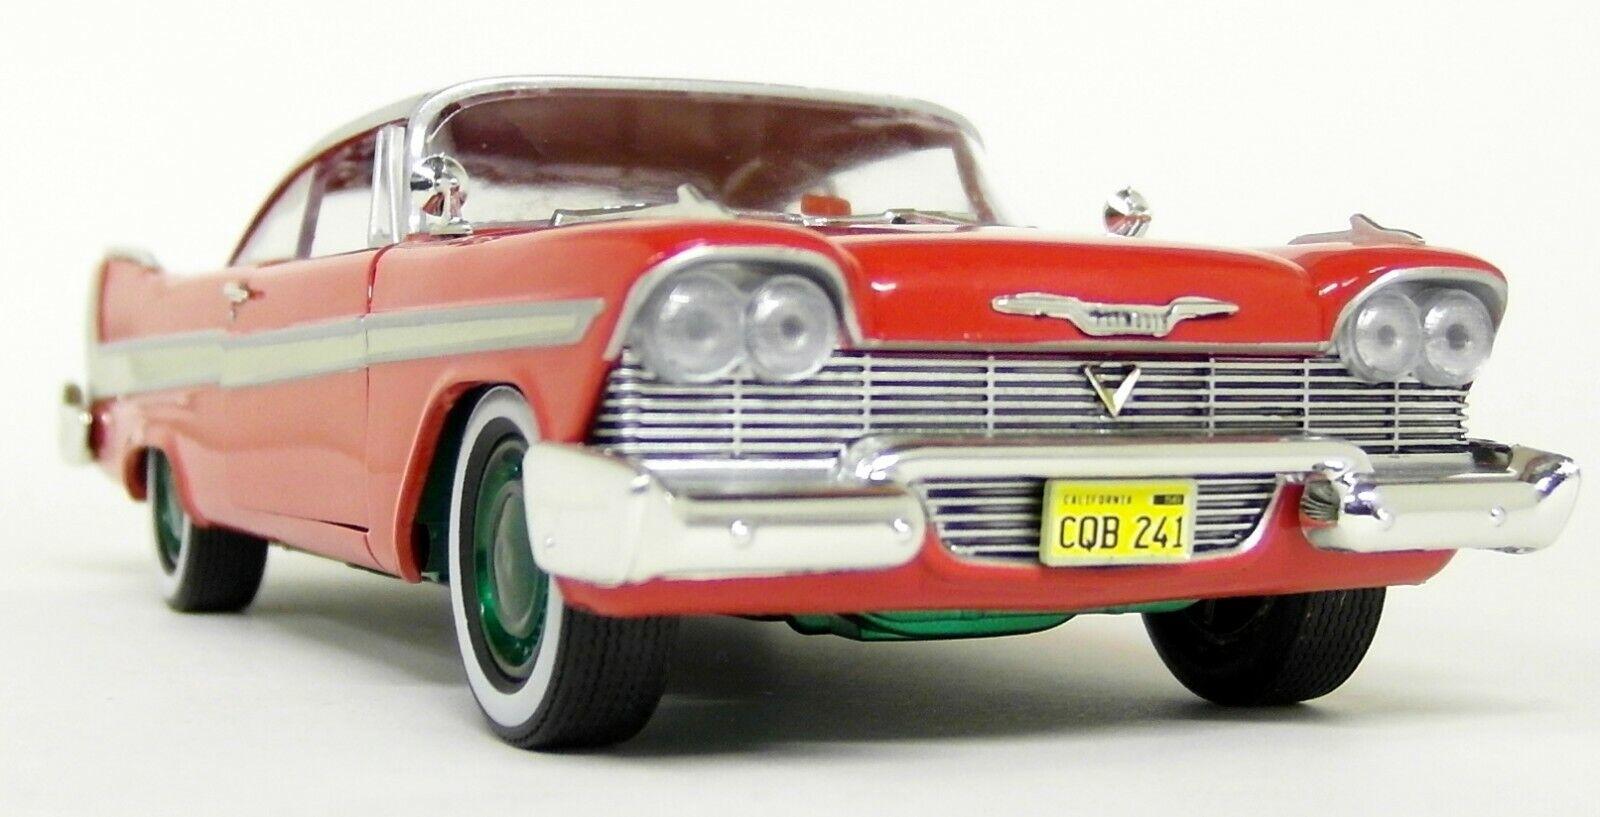 Precio por piso verdelight escala 1 24 1958 Plymouth Fury Christine película película película verde rueda Chase coche  bajo precio